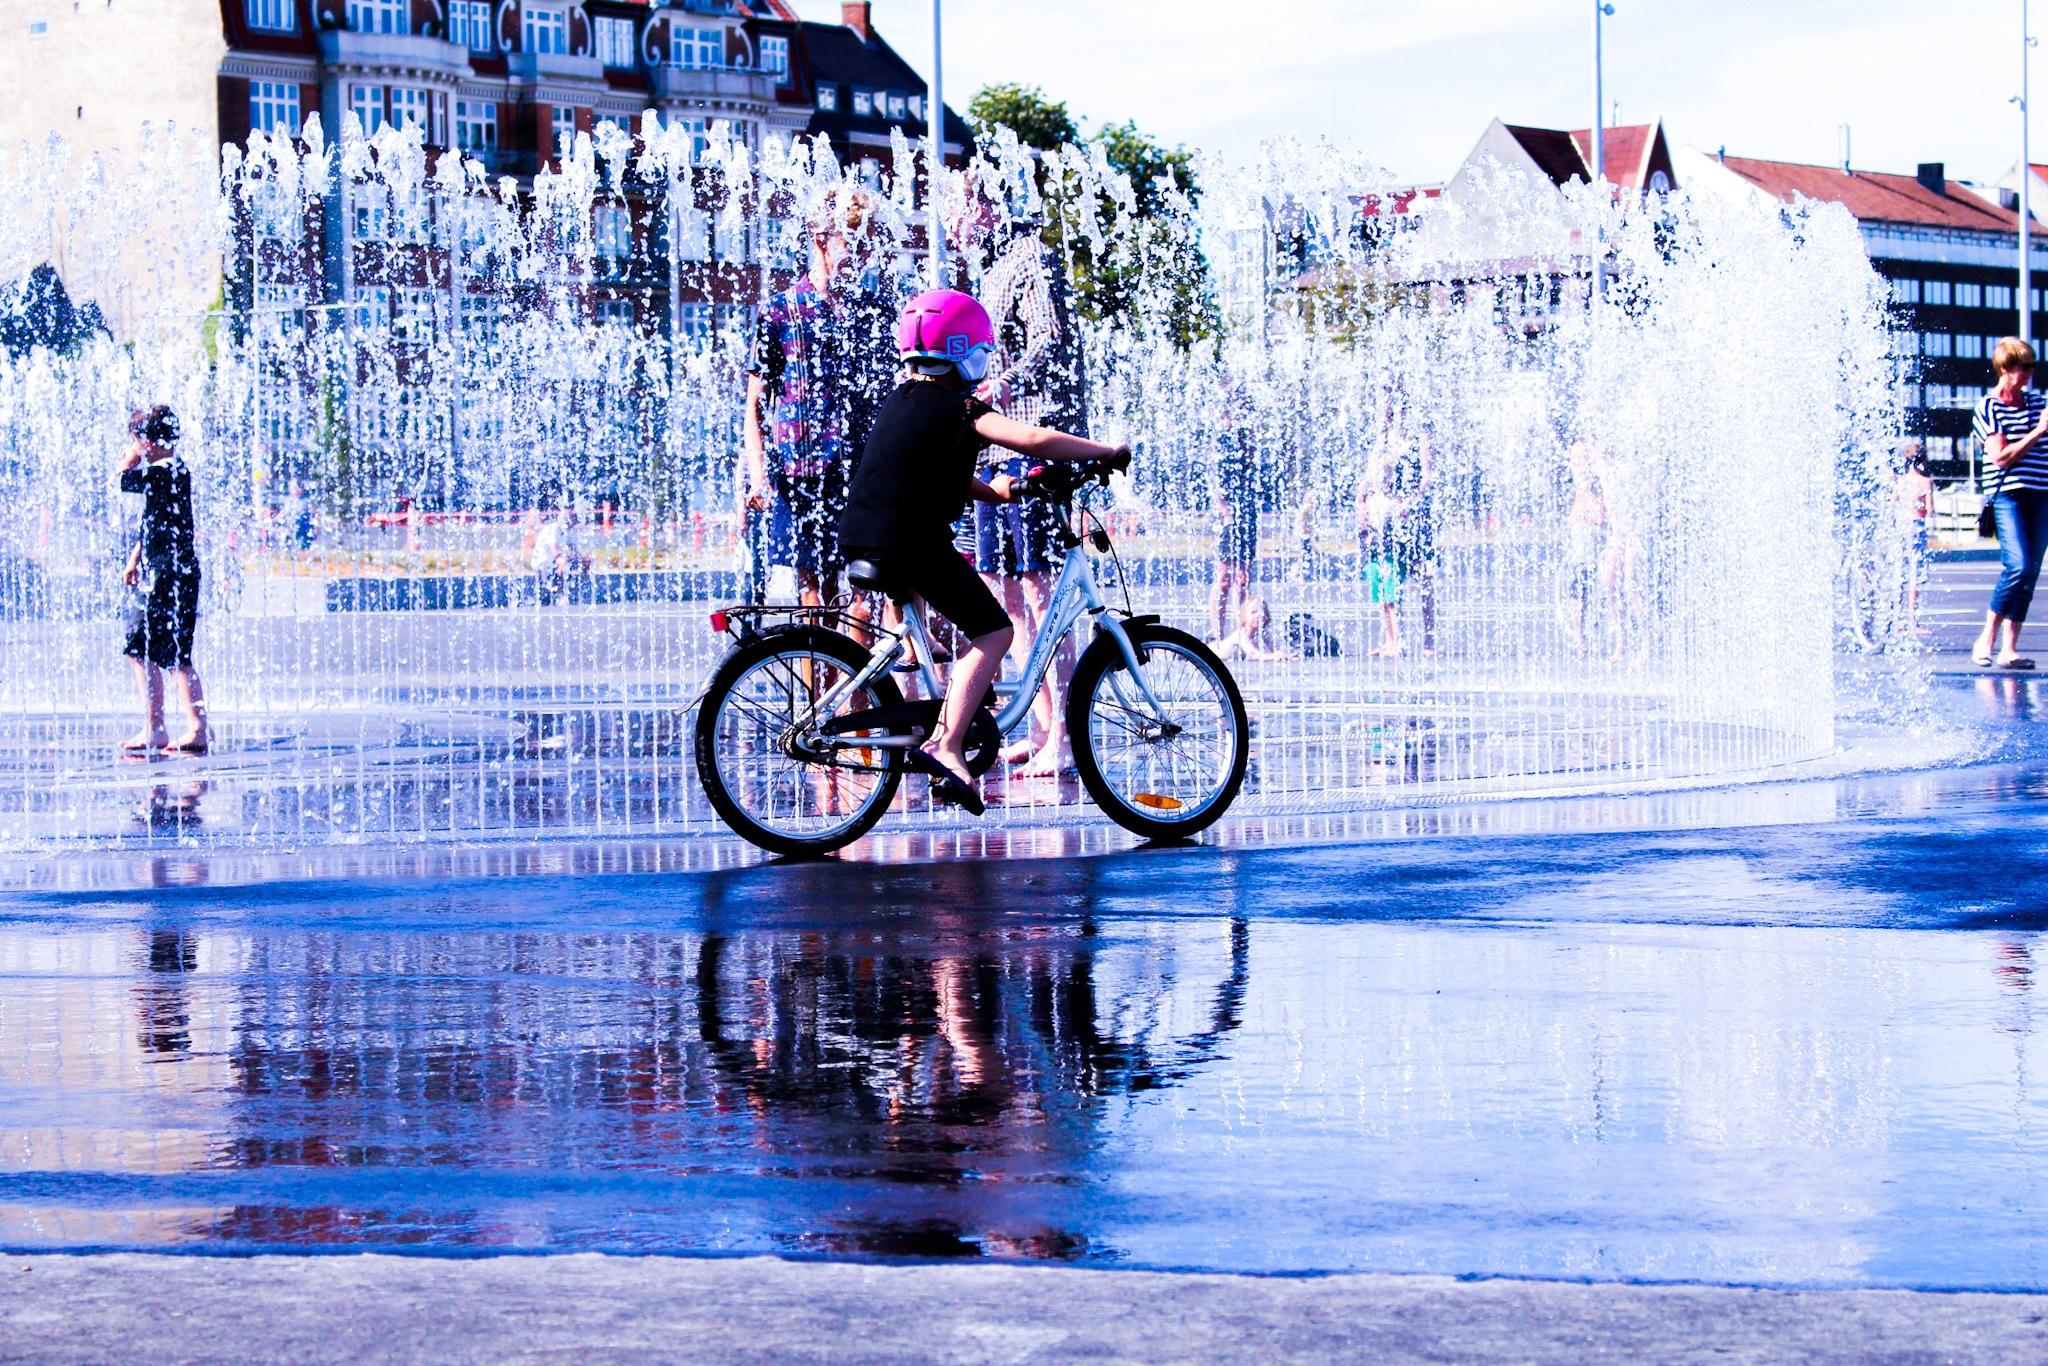 fountain in Arhus Denmark by Paul Kaliisa